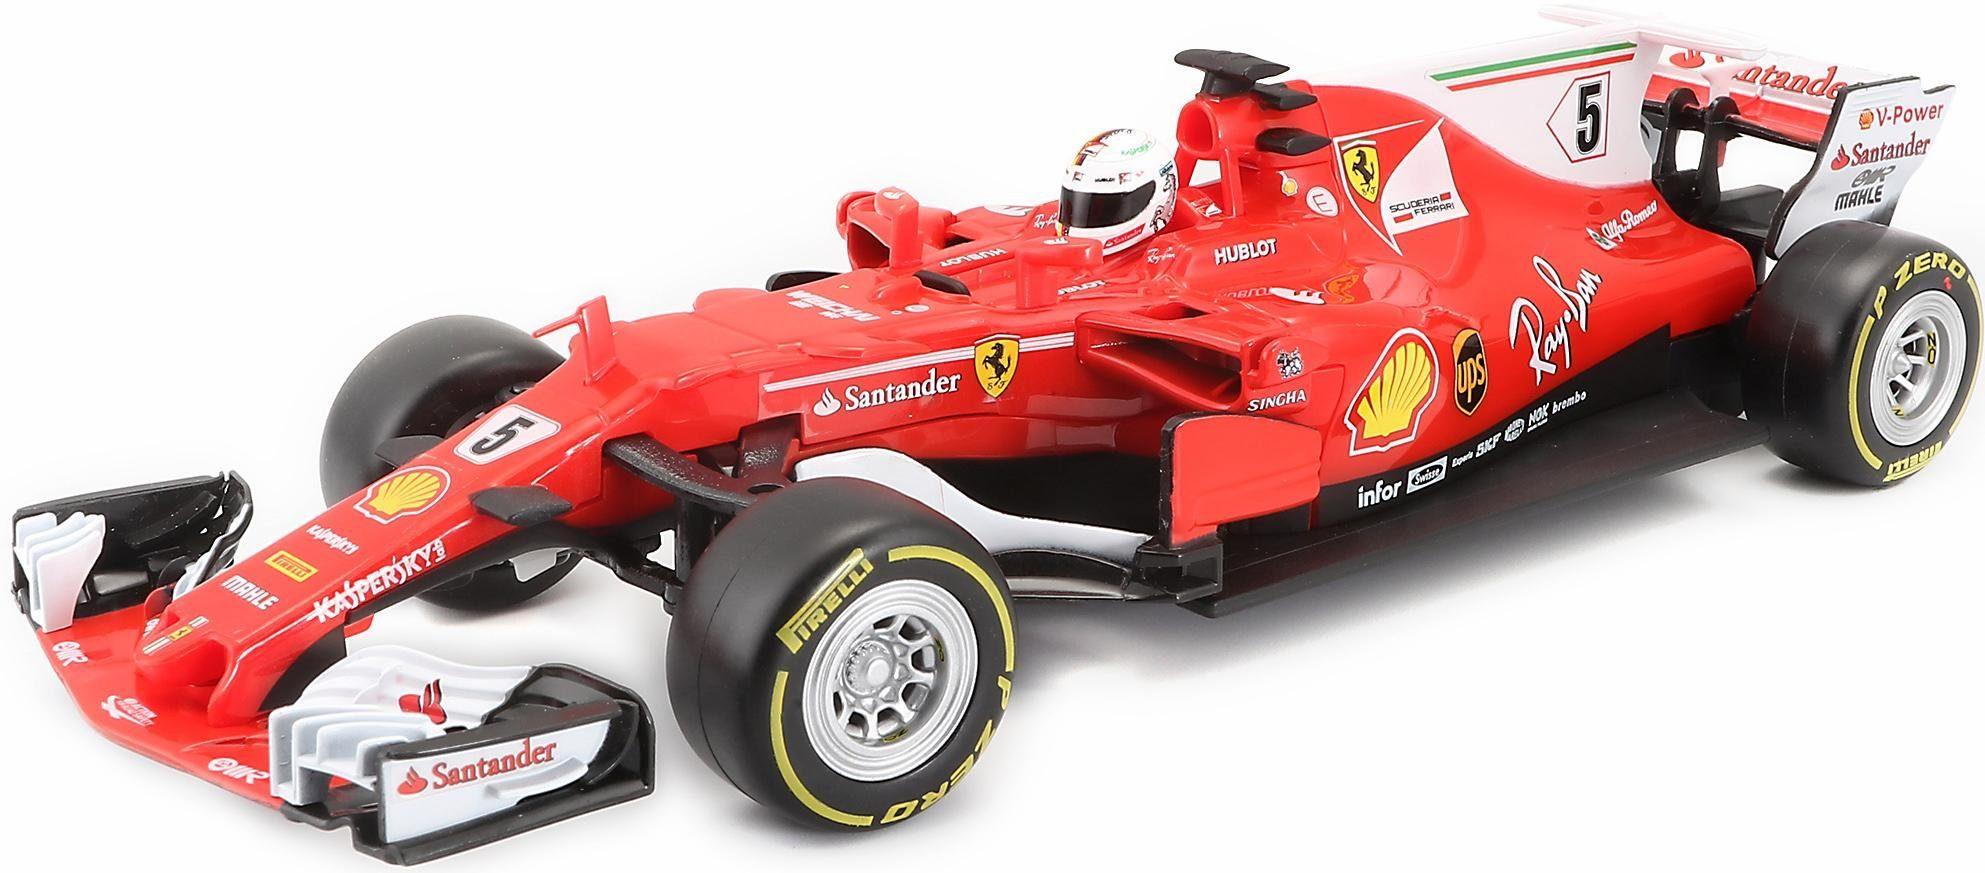 Maisto Tech® RC Auto, »R/C F1 Ferrari '17, 1:24, rot«